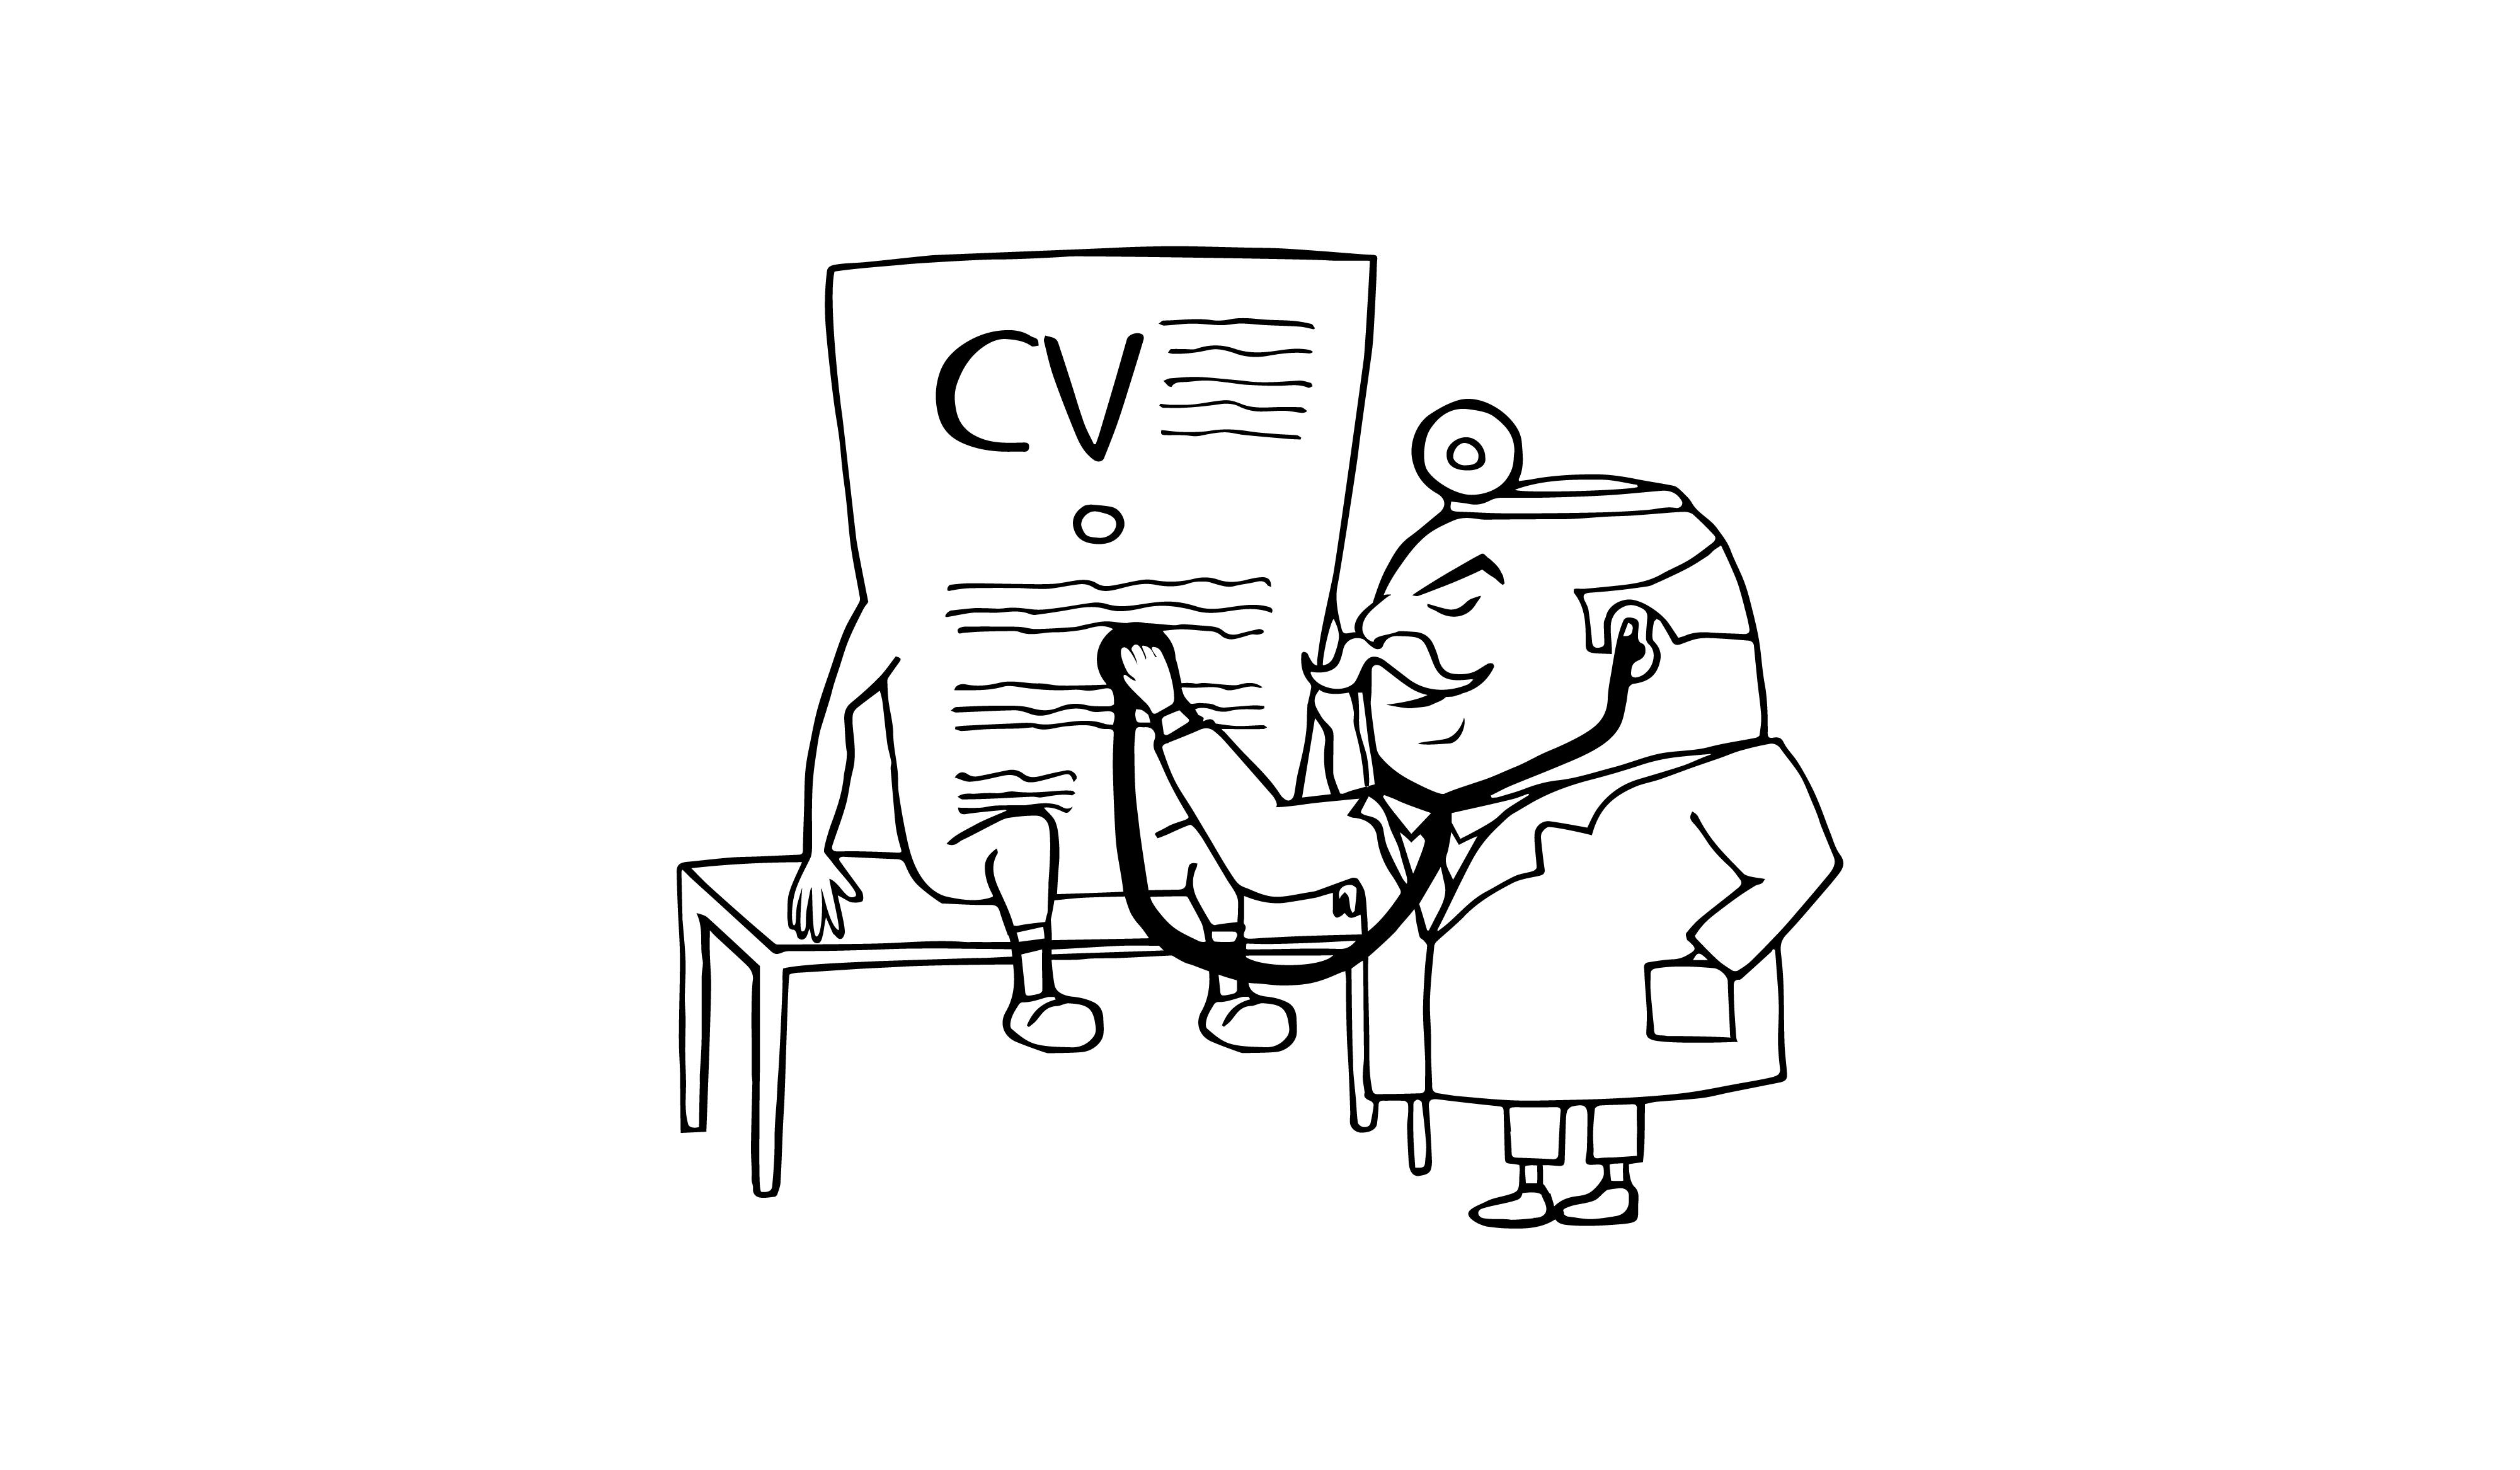 cv top tips atlas translations translation work agency freelance linguists clare